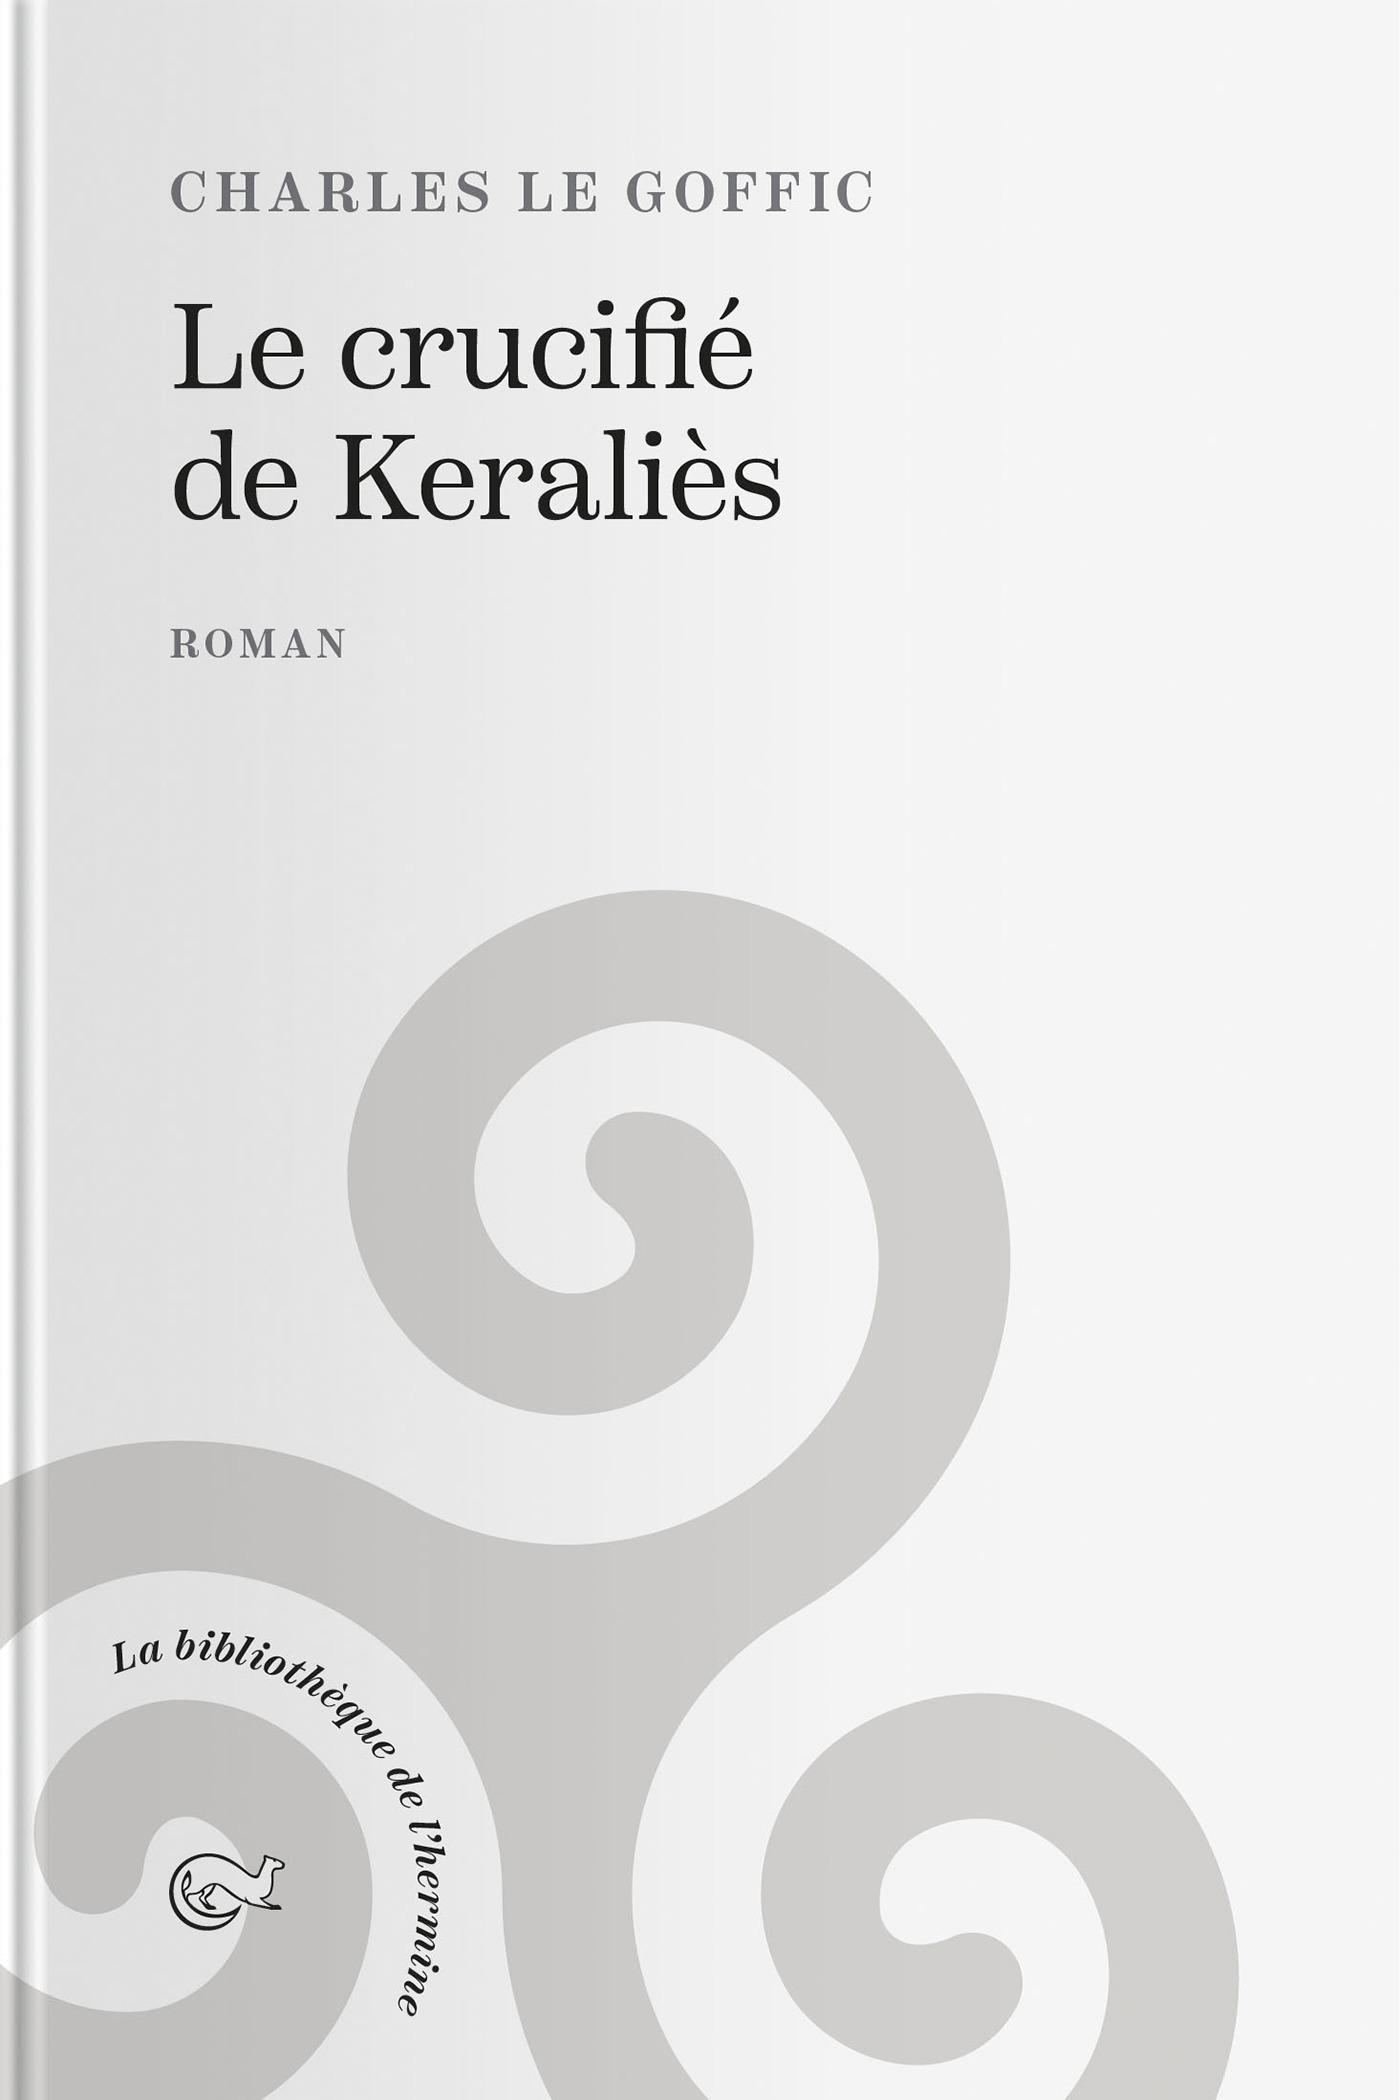 Le Crucifie de Keralies